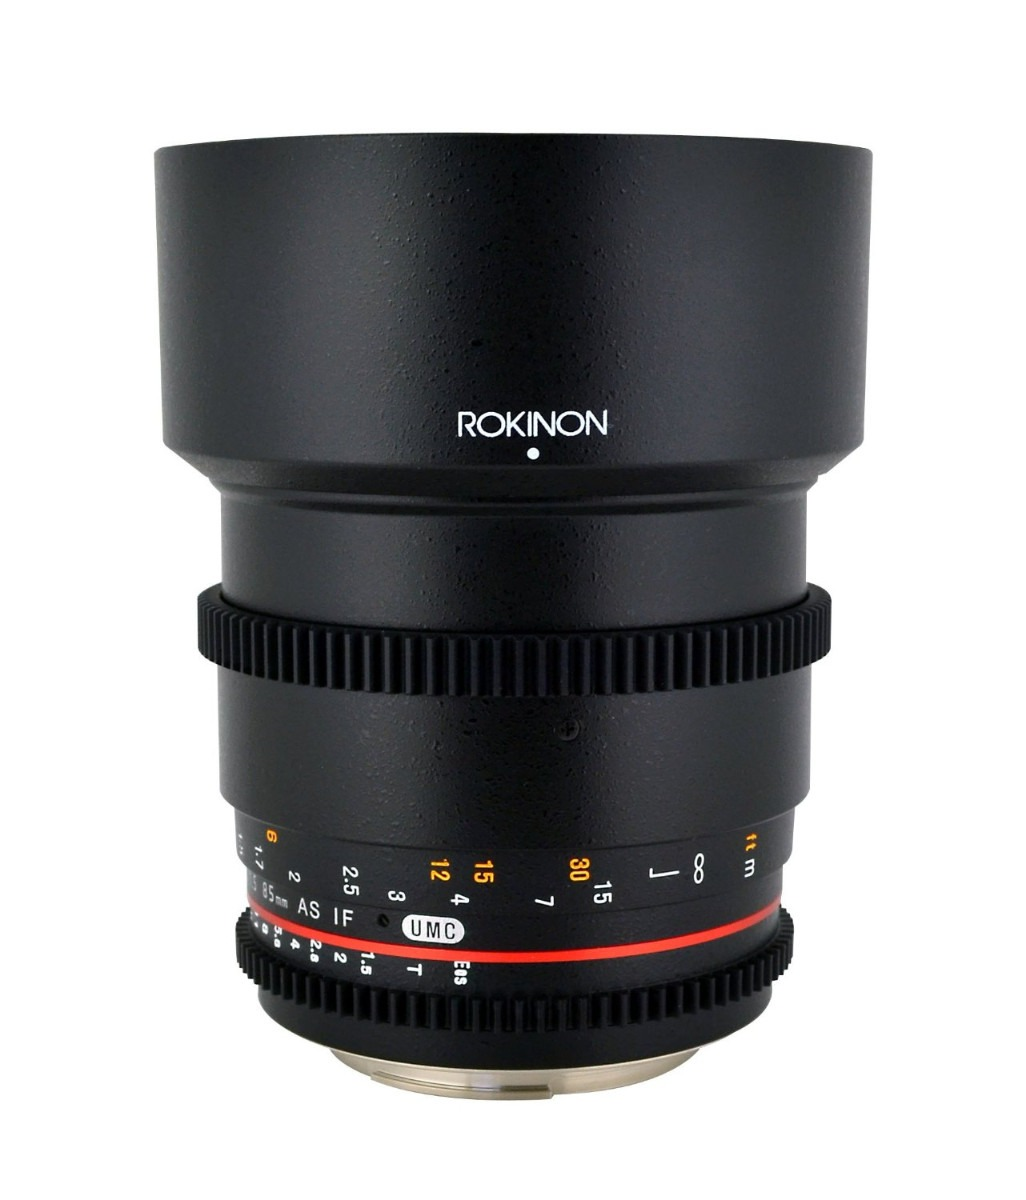 lente-rokinon-85mm-t15-cine-lens-p-video-dslr-canon-ef-maa-D_NQ_NP_3173-MLM3940615988_032013-F.jpg